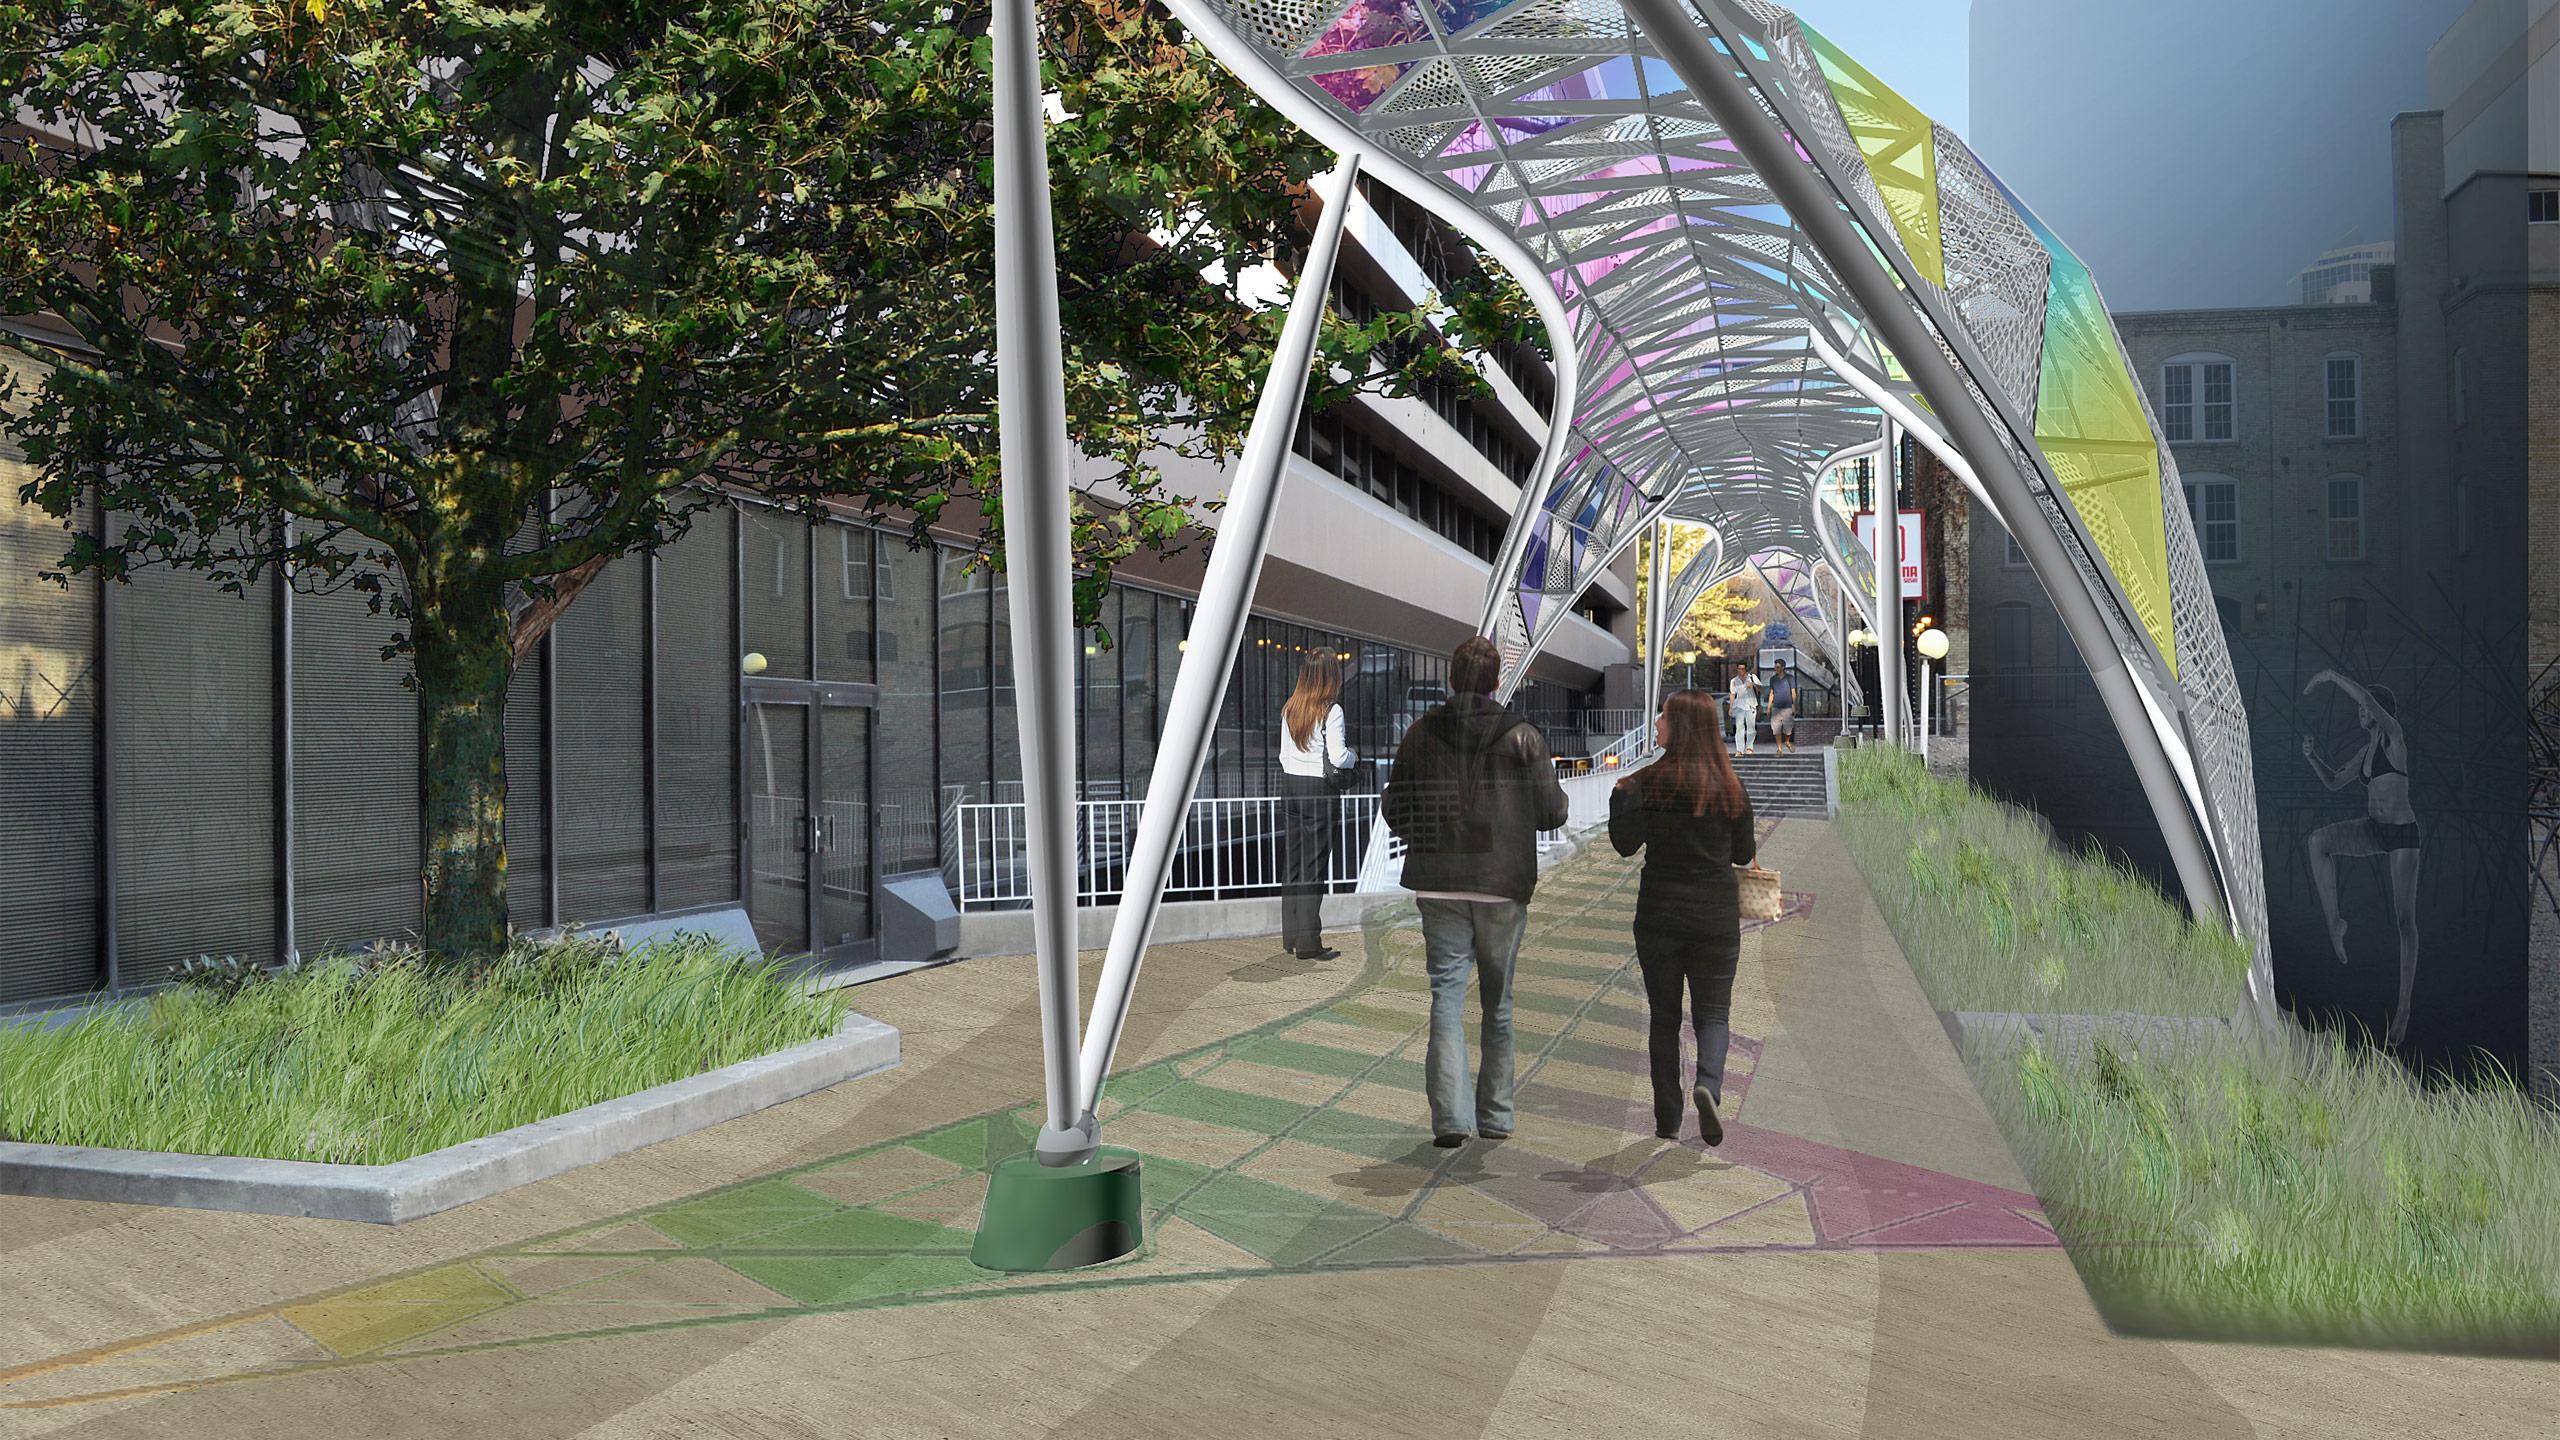 69|70 Arts District Plan / image 8